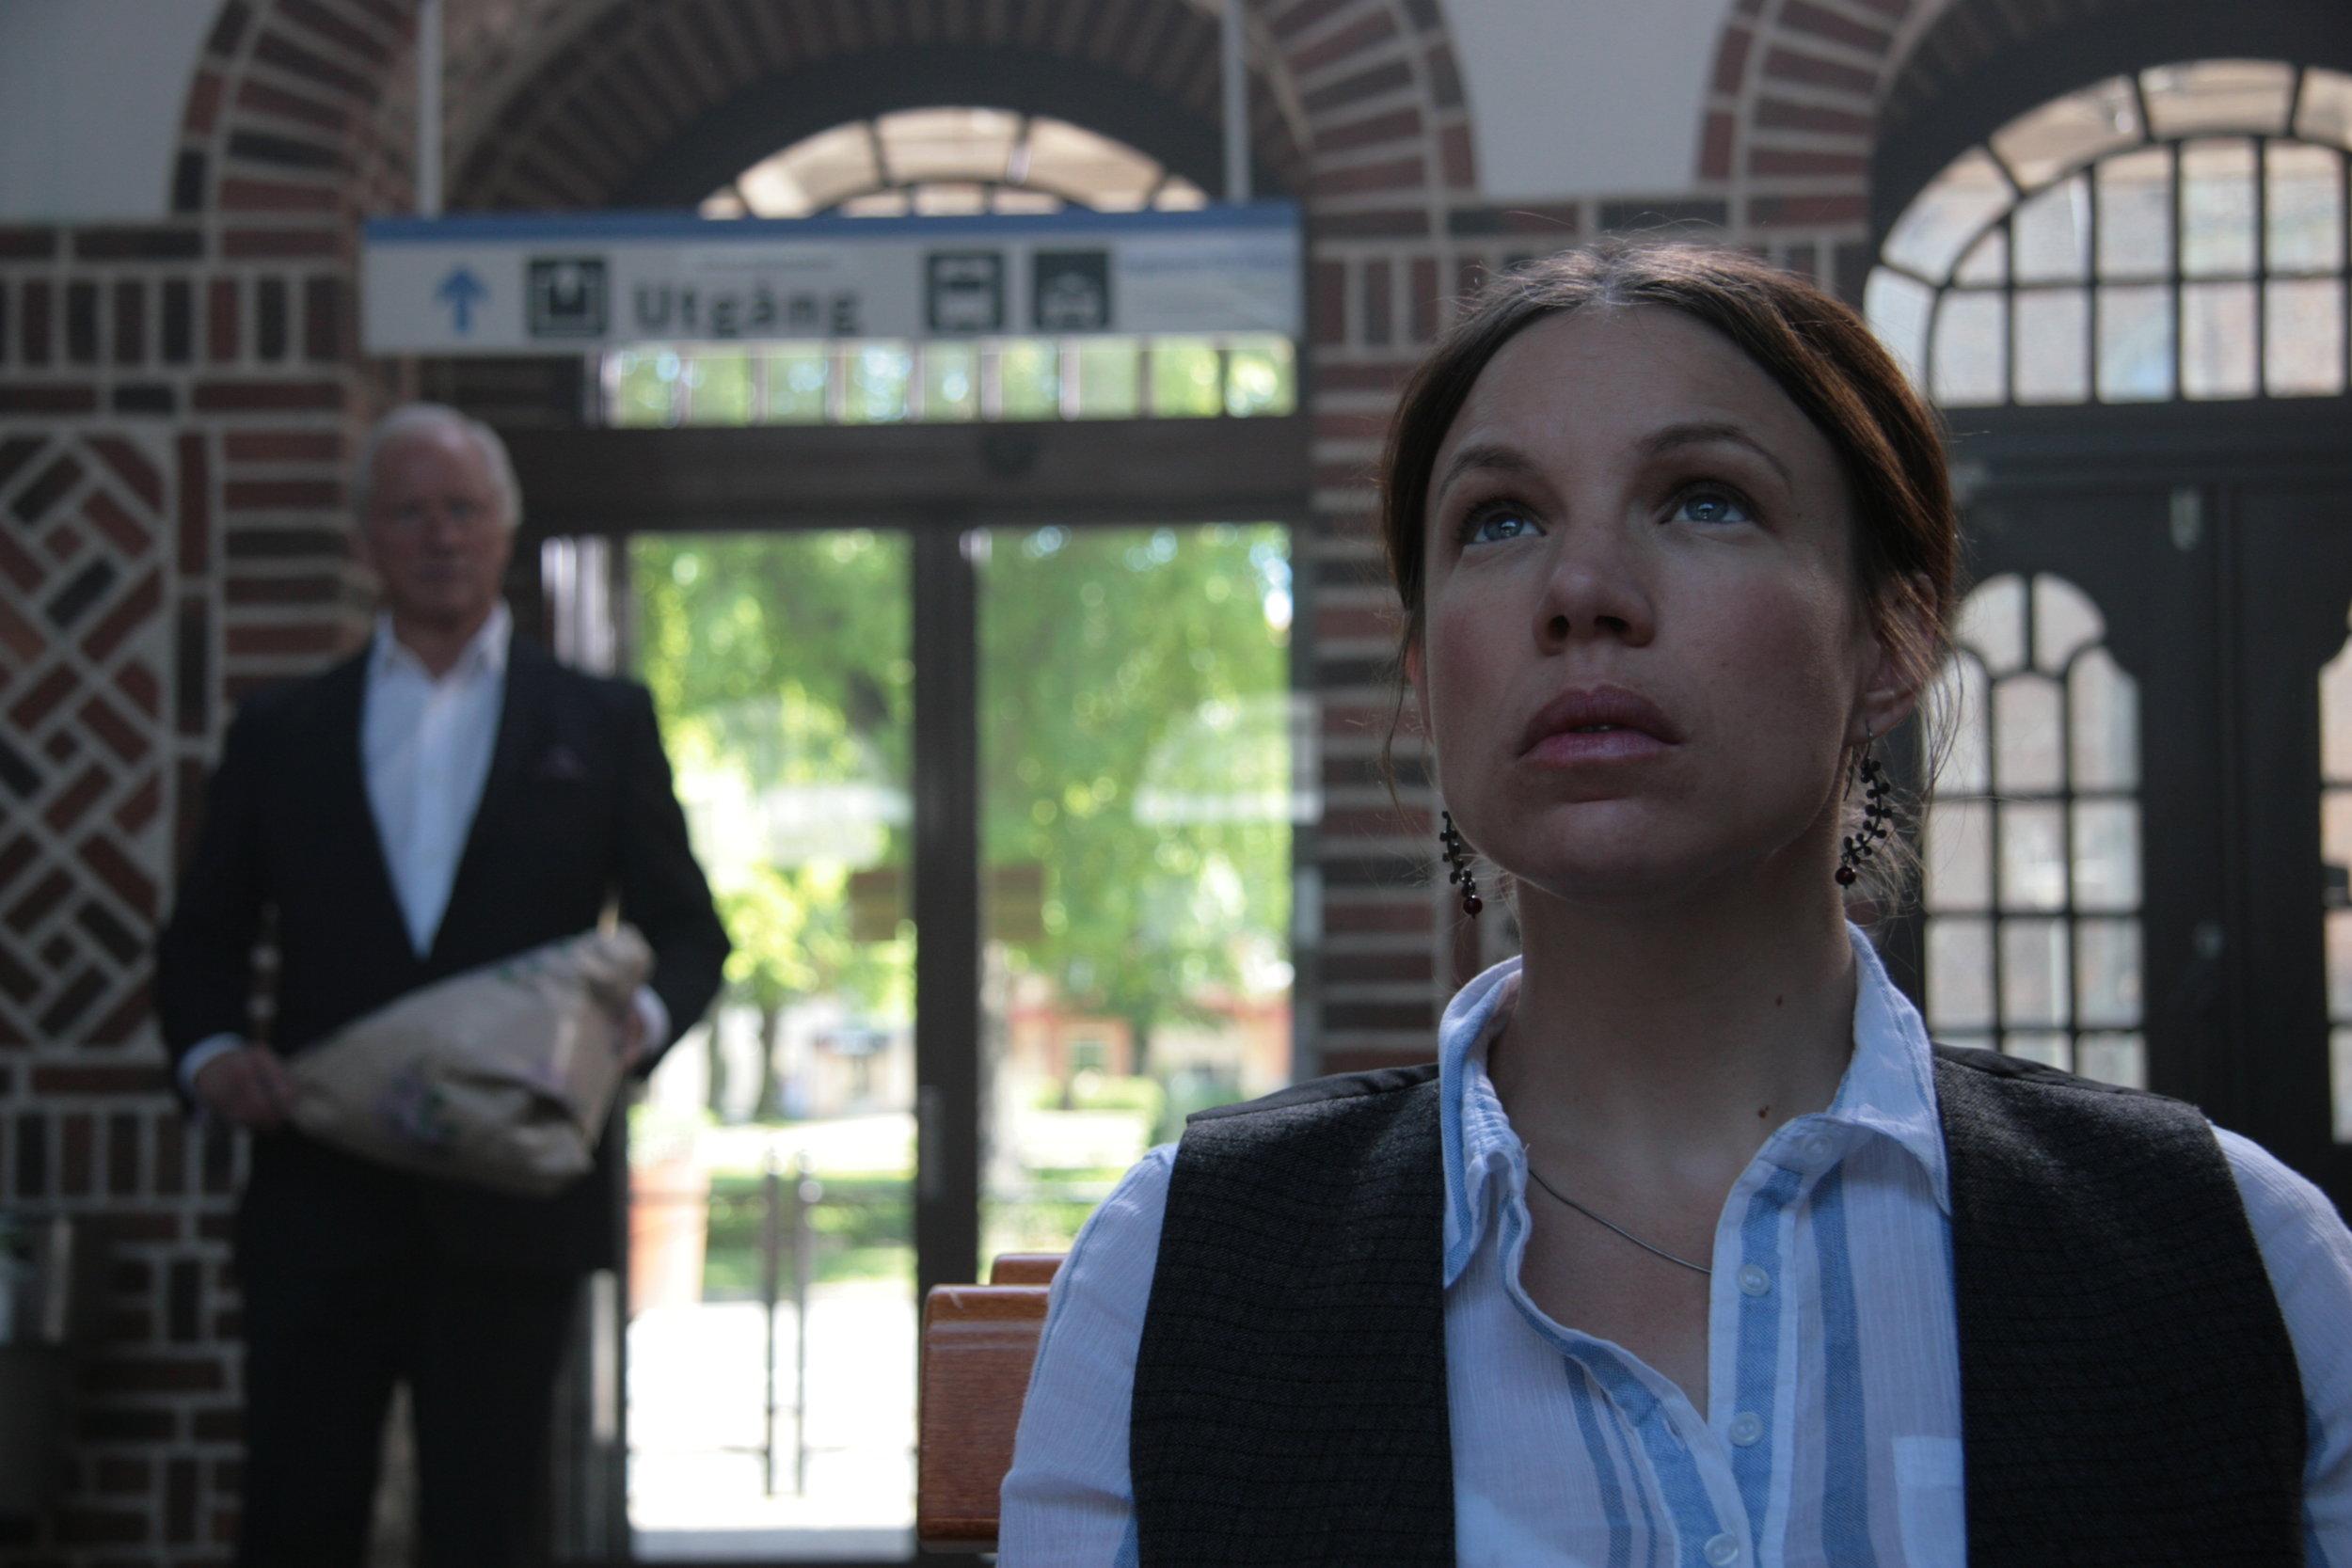 Alice (Ellen Jelinek) and her father (Loa Falkman) at the train station. Tiny Lumberjack copyright.